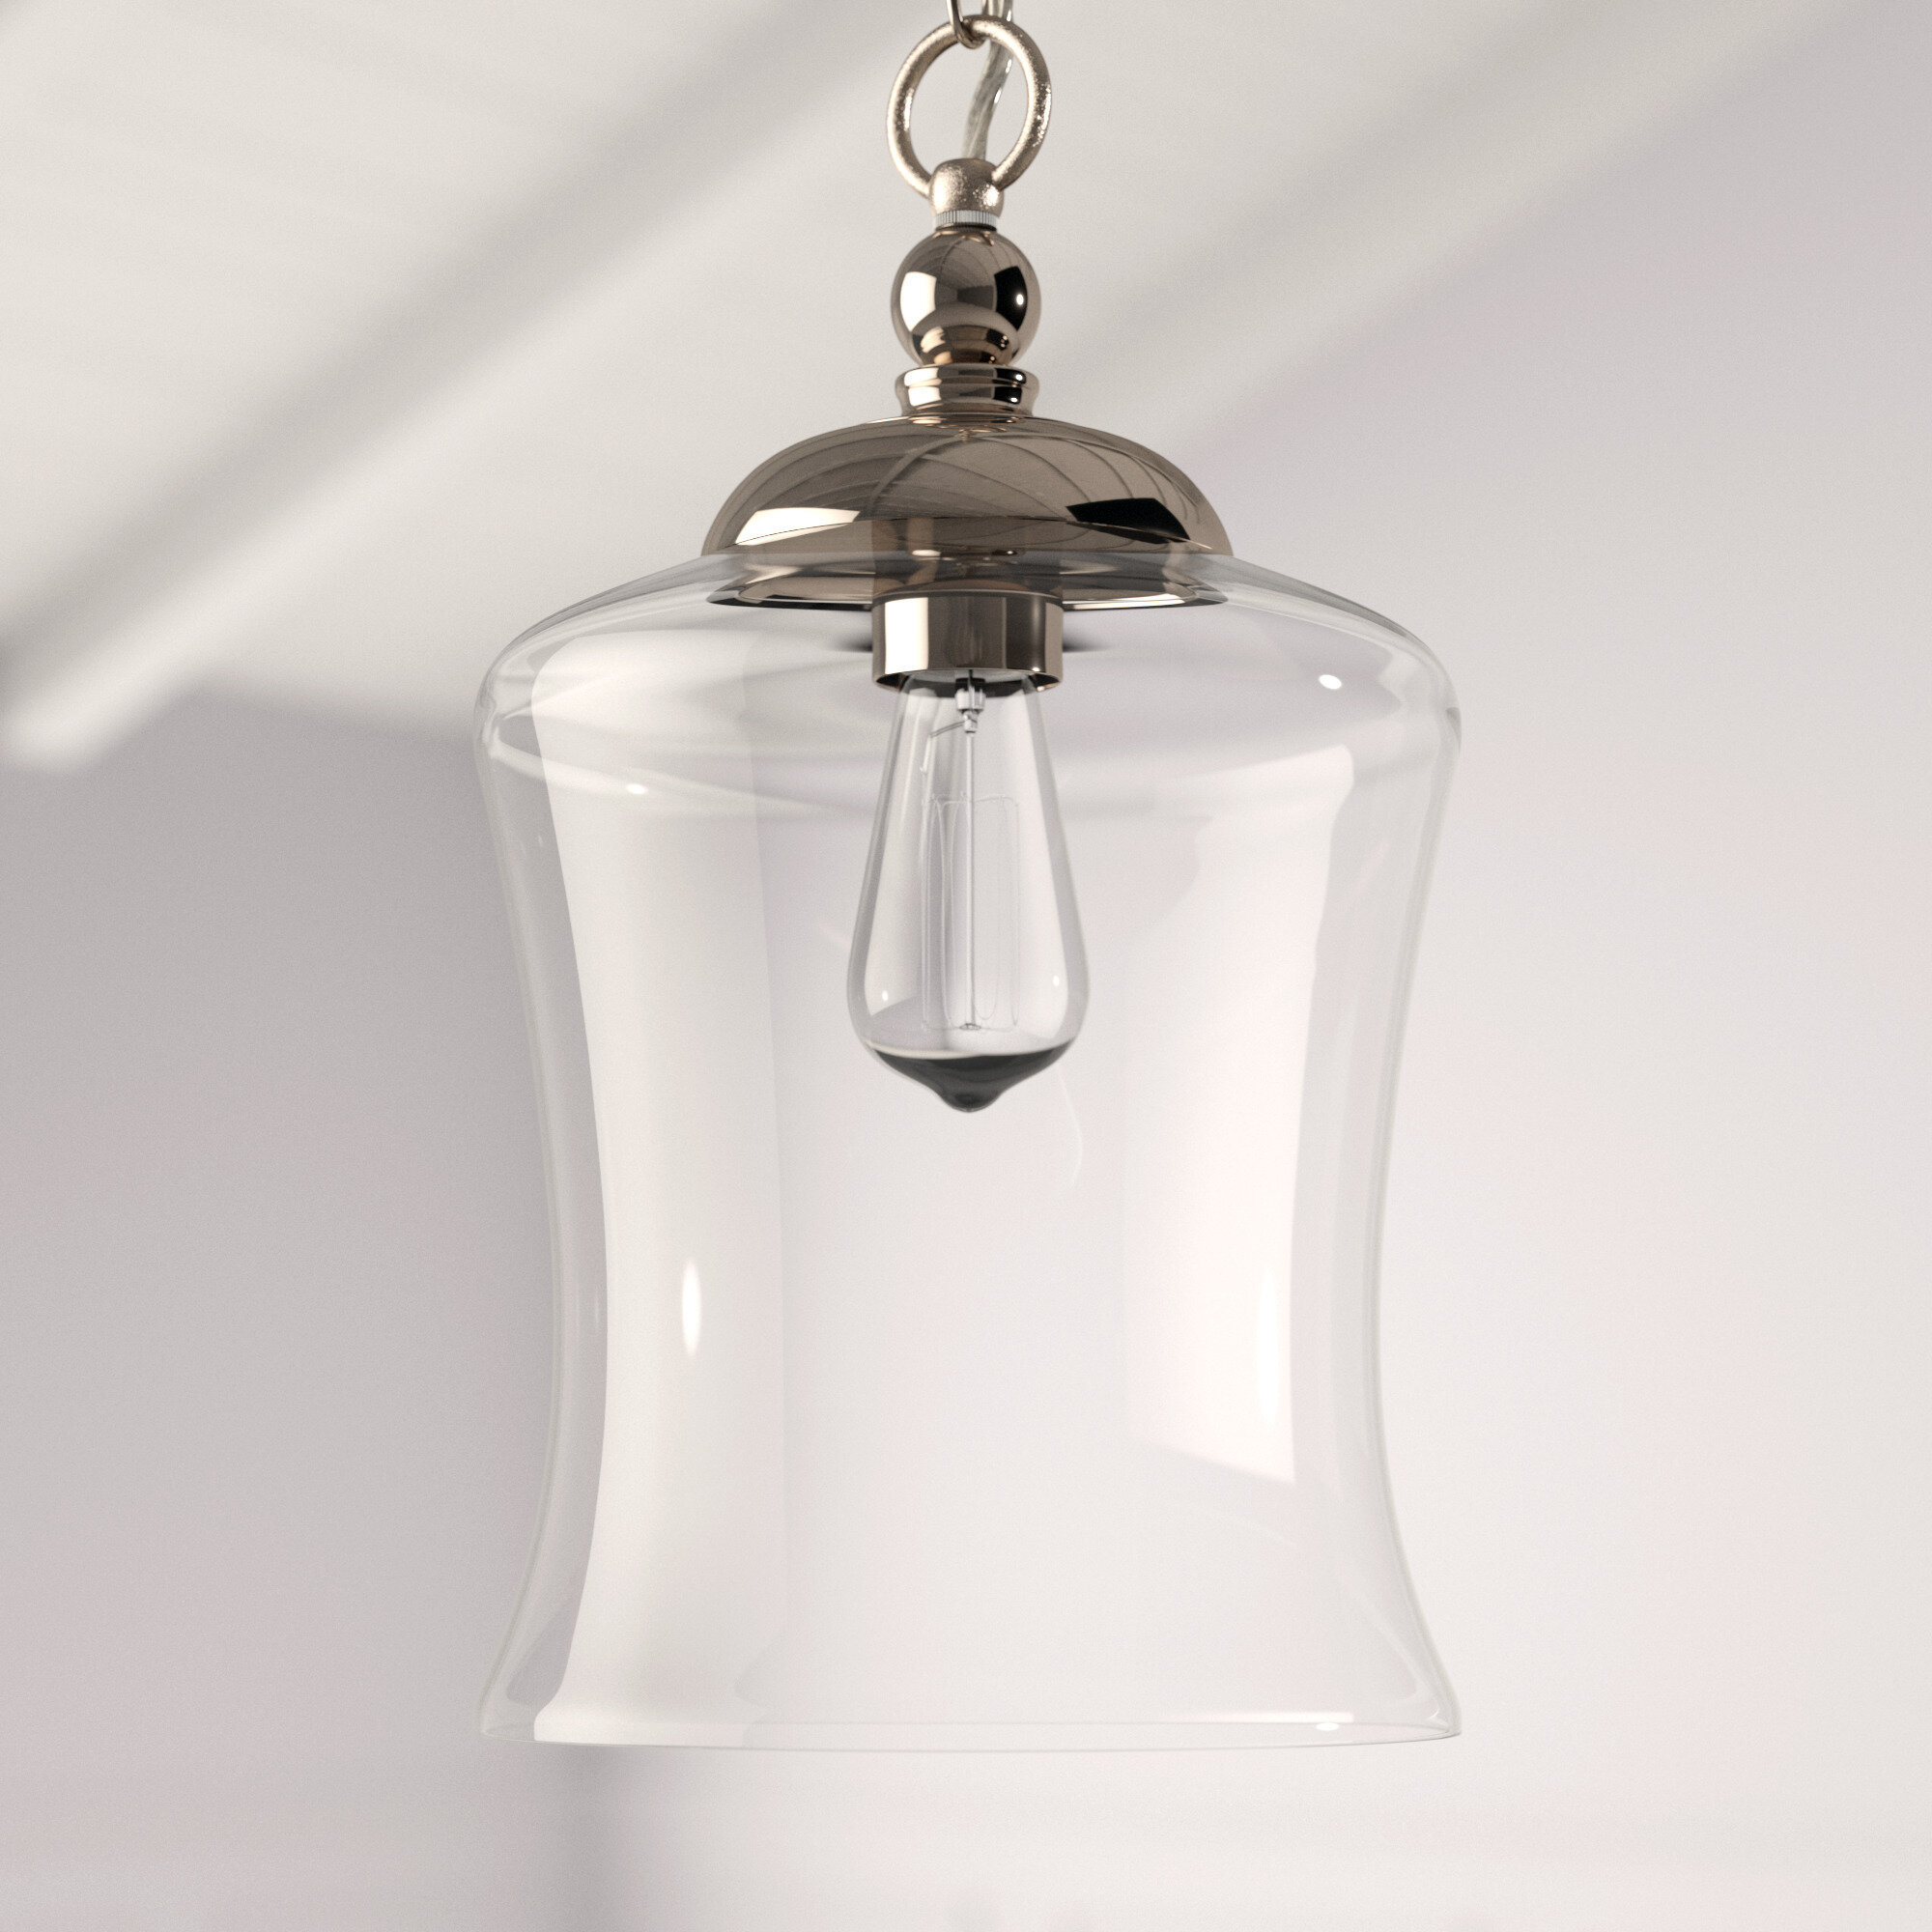 Wentzville 1-Light Single Bell Pendant in Moyer 1-Light Single Cylinder Pendants (Image 27 of 30)